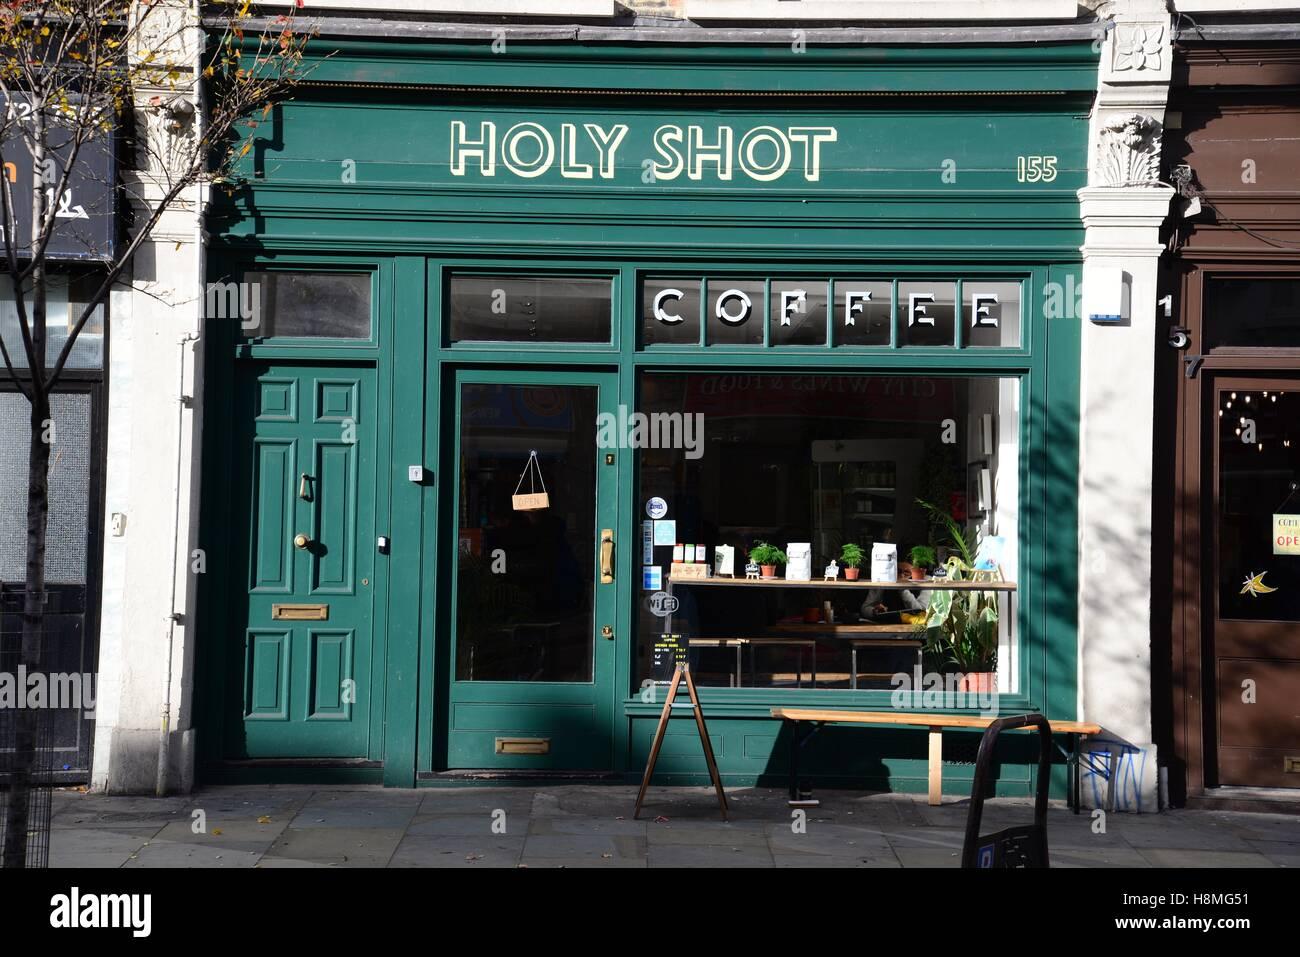 Holy Shot coffee shop, Bethnal Green Road, Shoreditch, London Stock Photo: 125841549 - Alamy